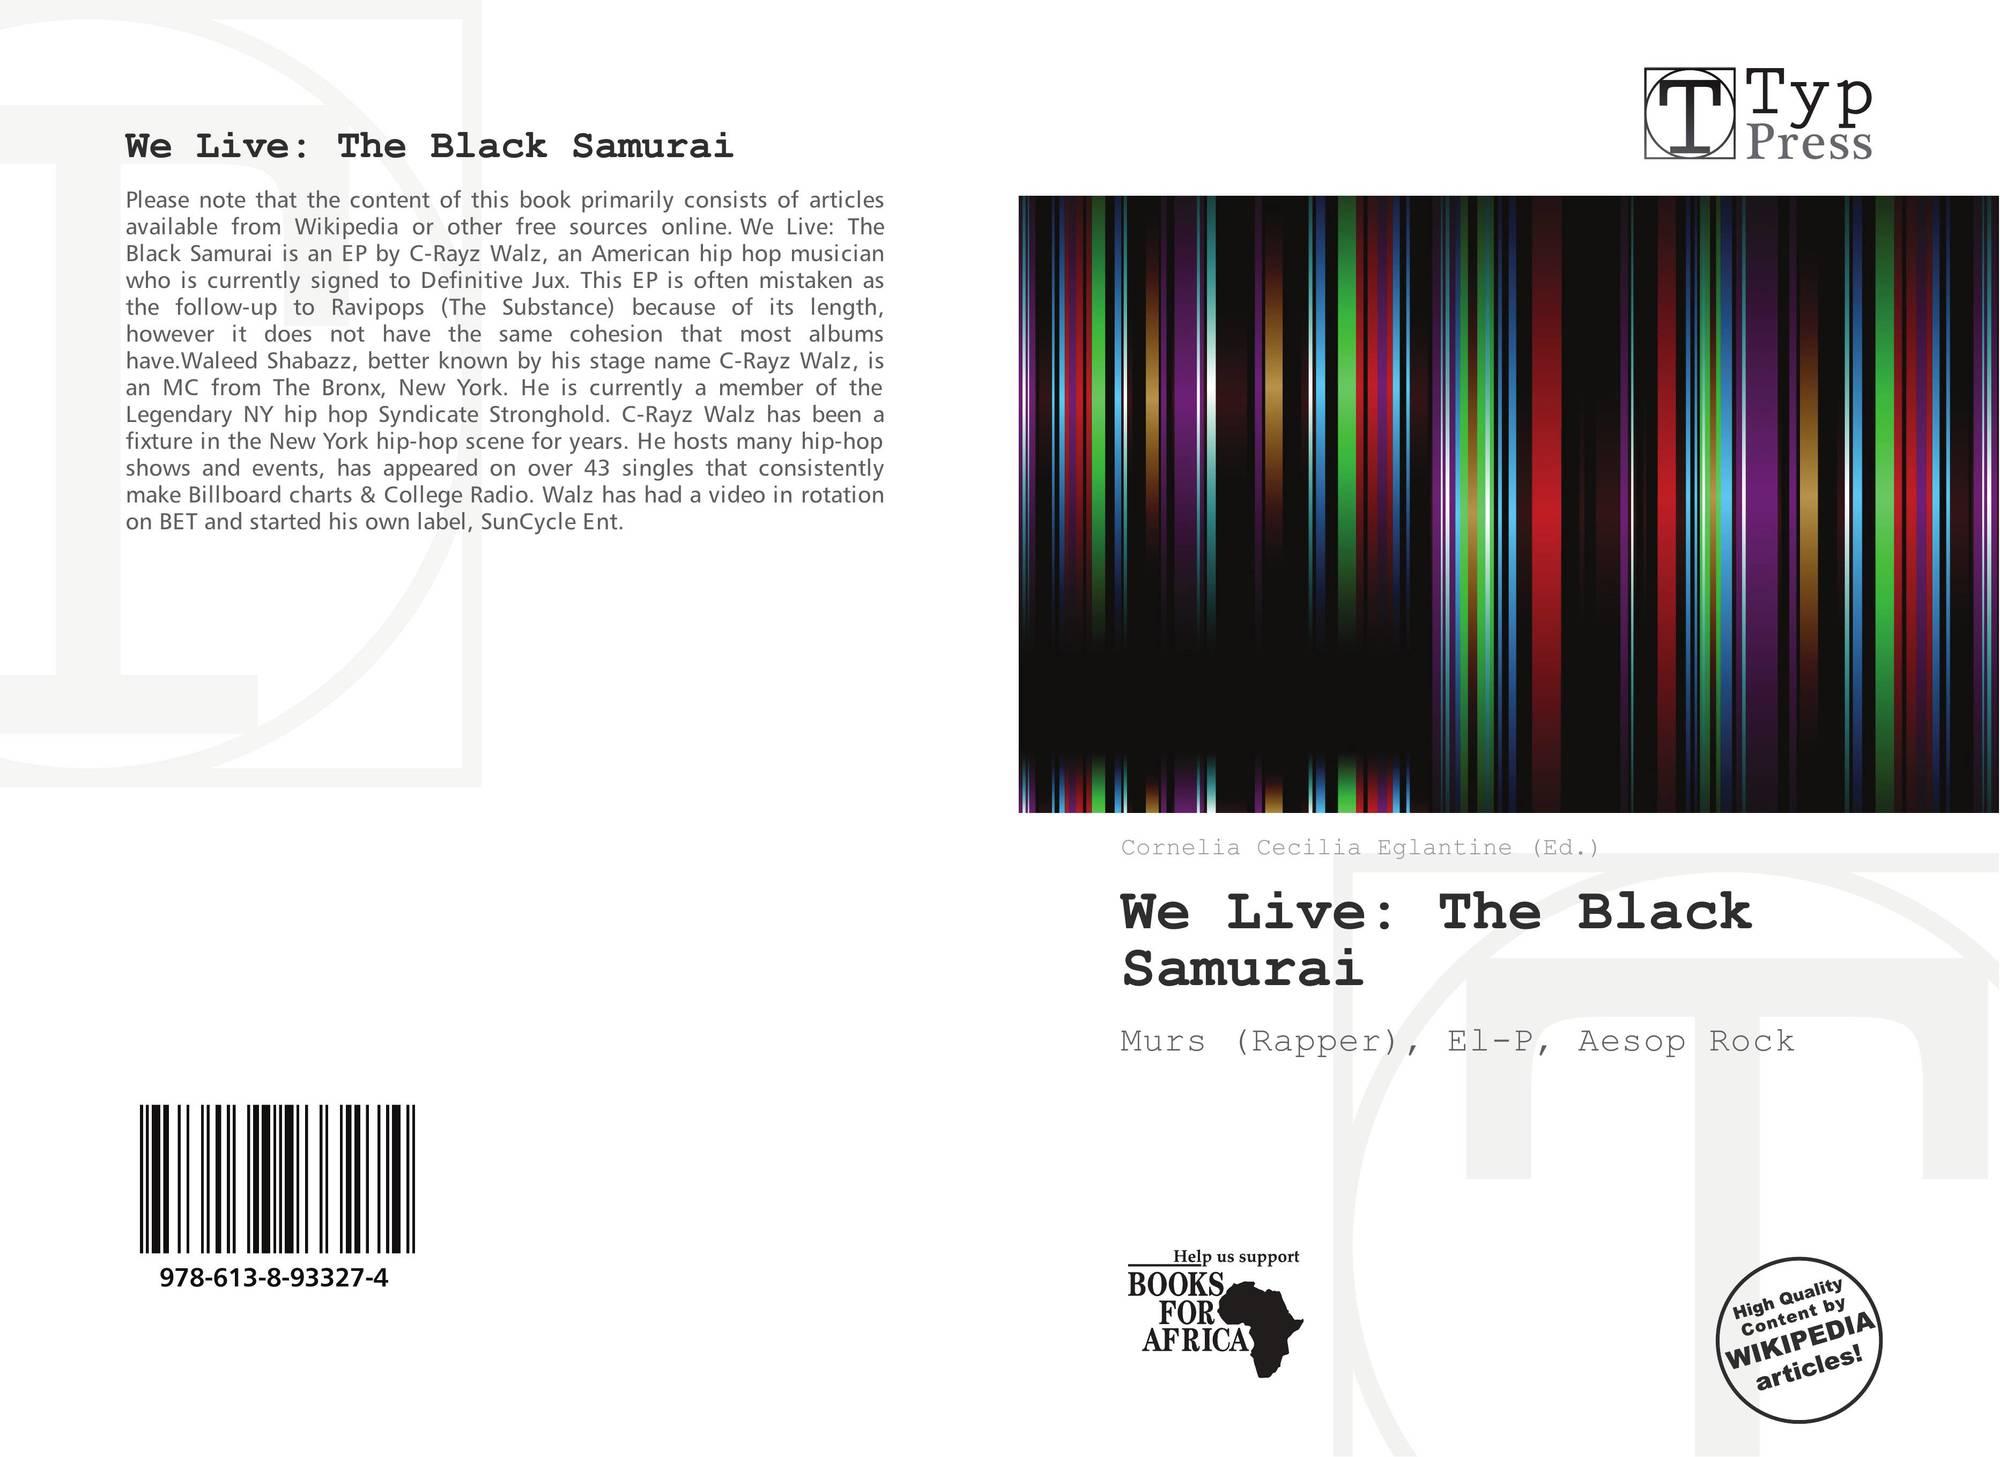 We Live: The Black Samurai, 978-613-8-93327-4, 6138933273